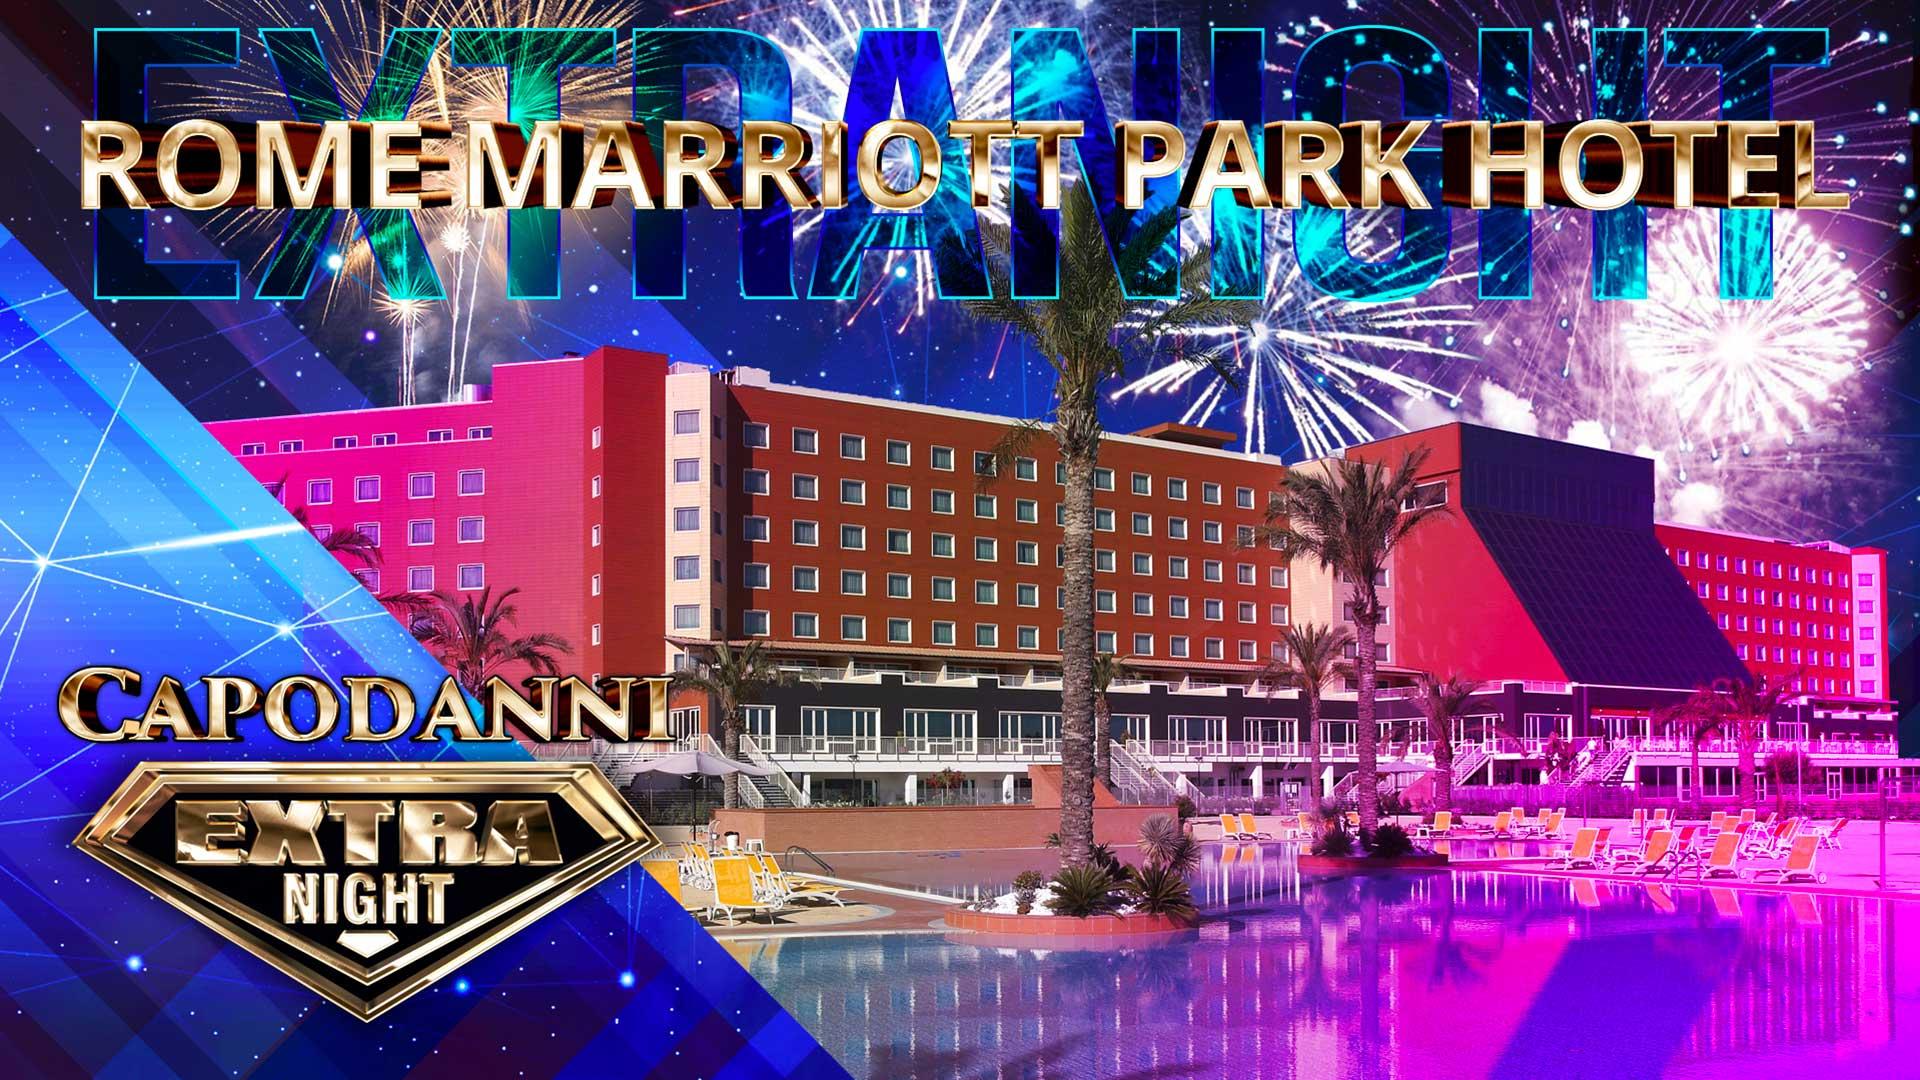 Capodanno Marriott Park Hotel